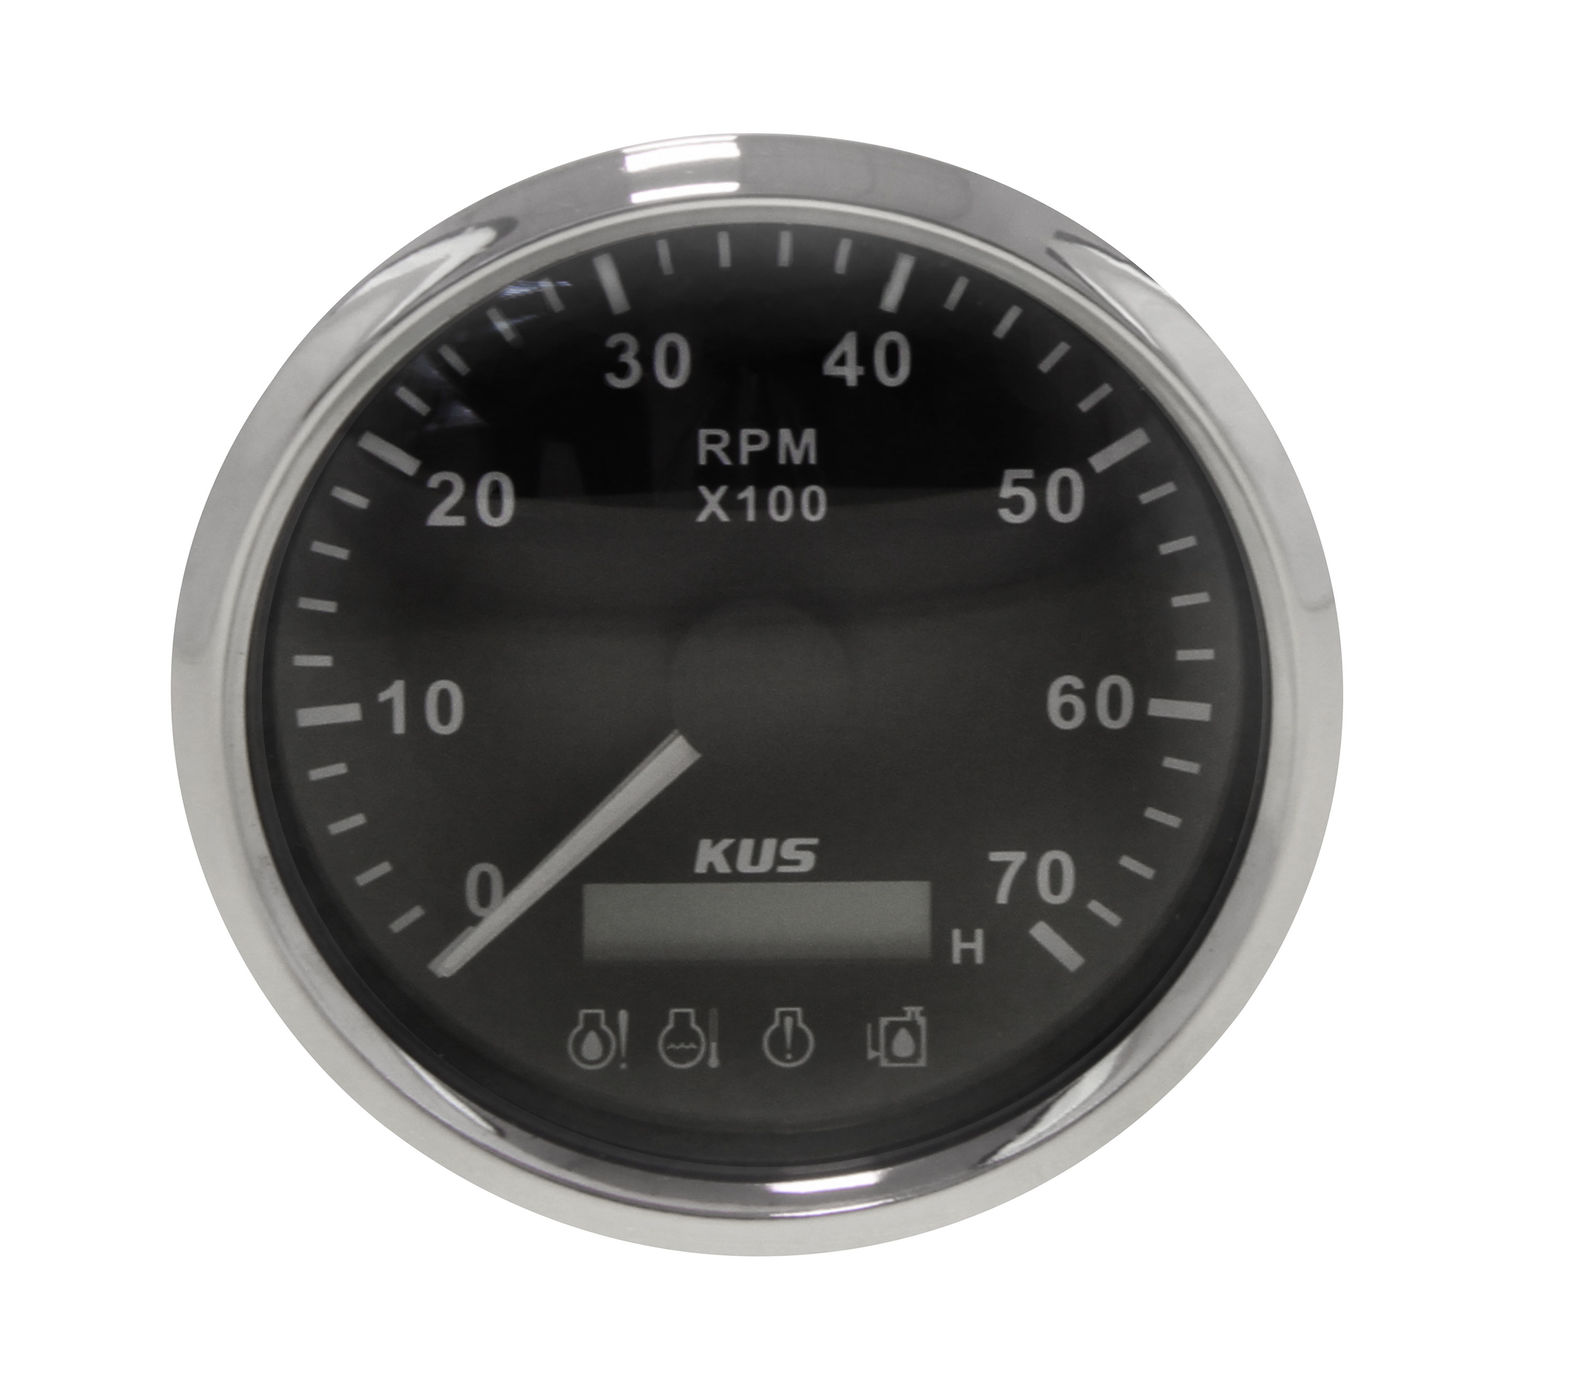 Tachometer 0-7000 Rev/min Alarm Divider 1-10, Black Dial Stainless Steel Bezel. 85mm KY07046